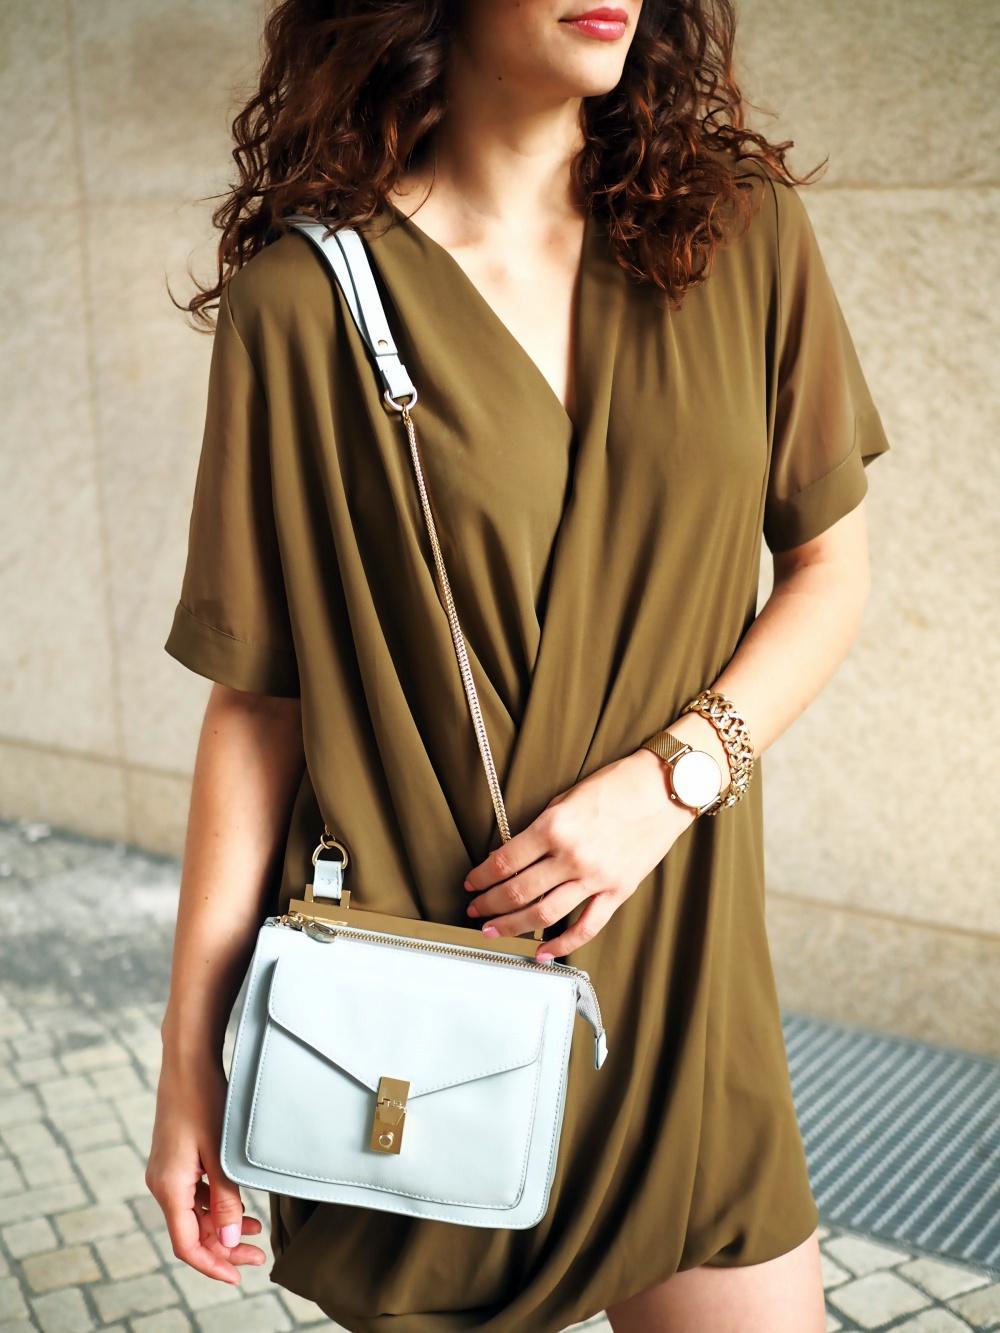 topshop-wrapped-dress-summer-streetstyle-zara-bag-khaki-chifffon-berlin-fashion